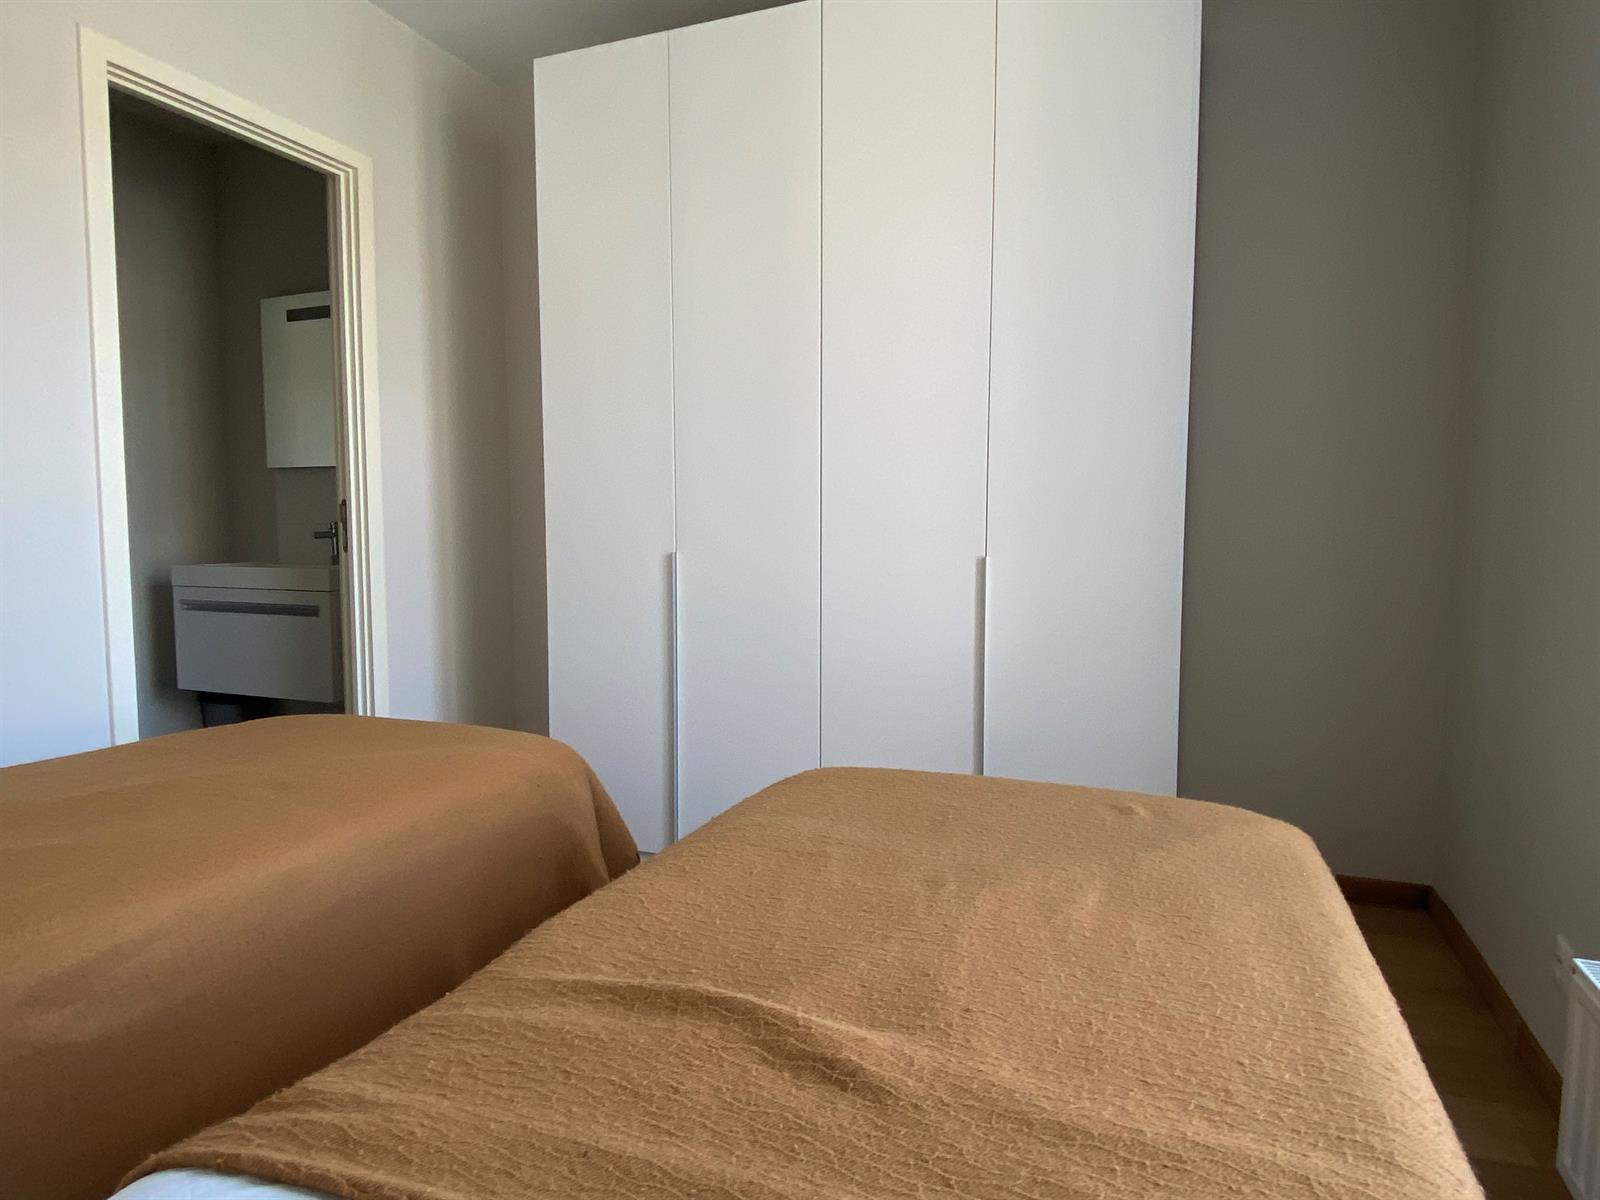 Flat - Etterbeek - #4389571-5